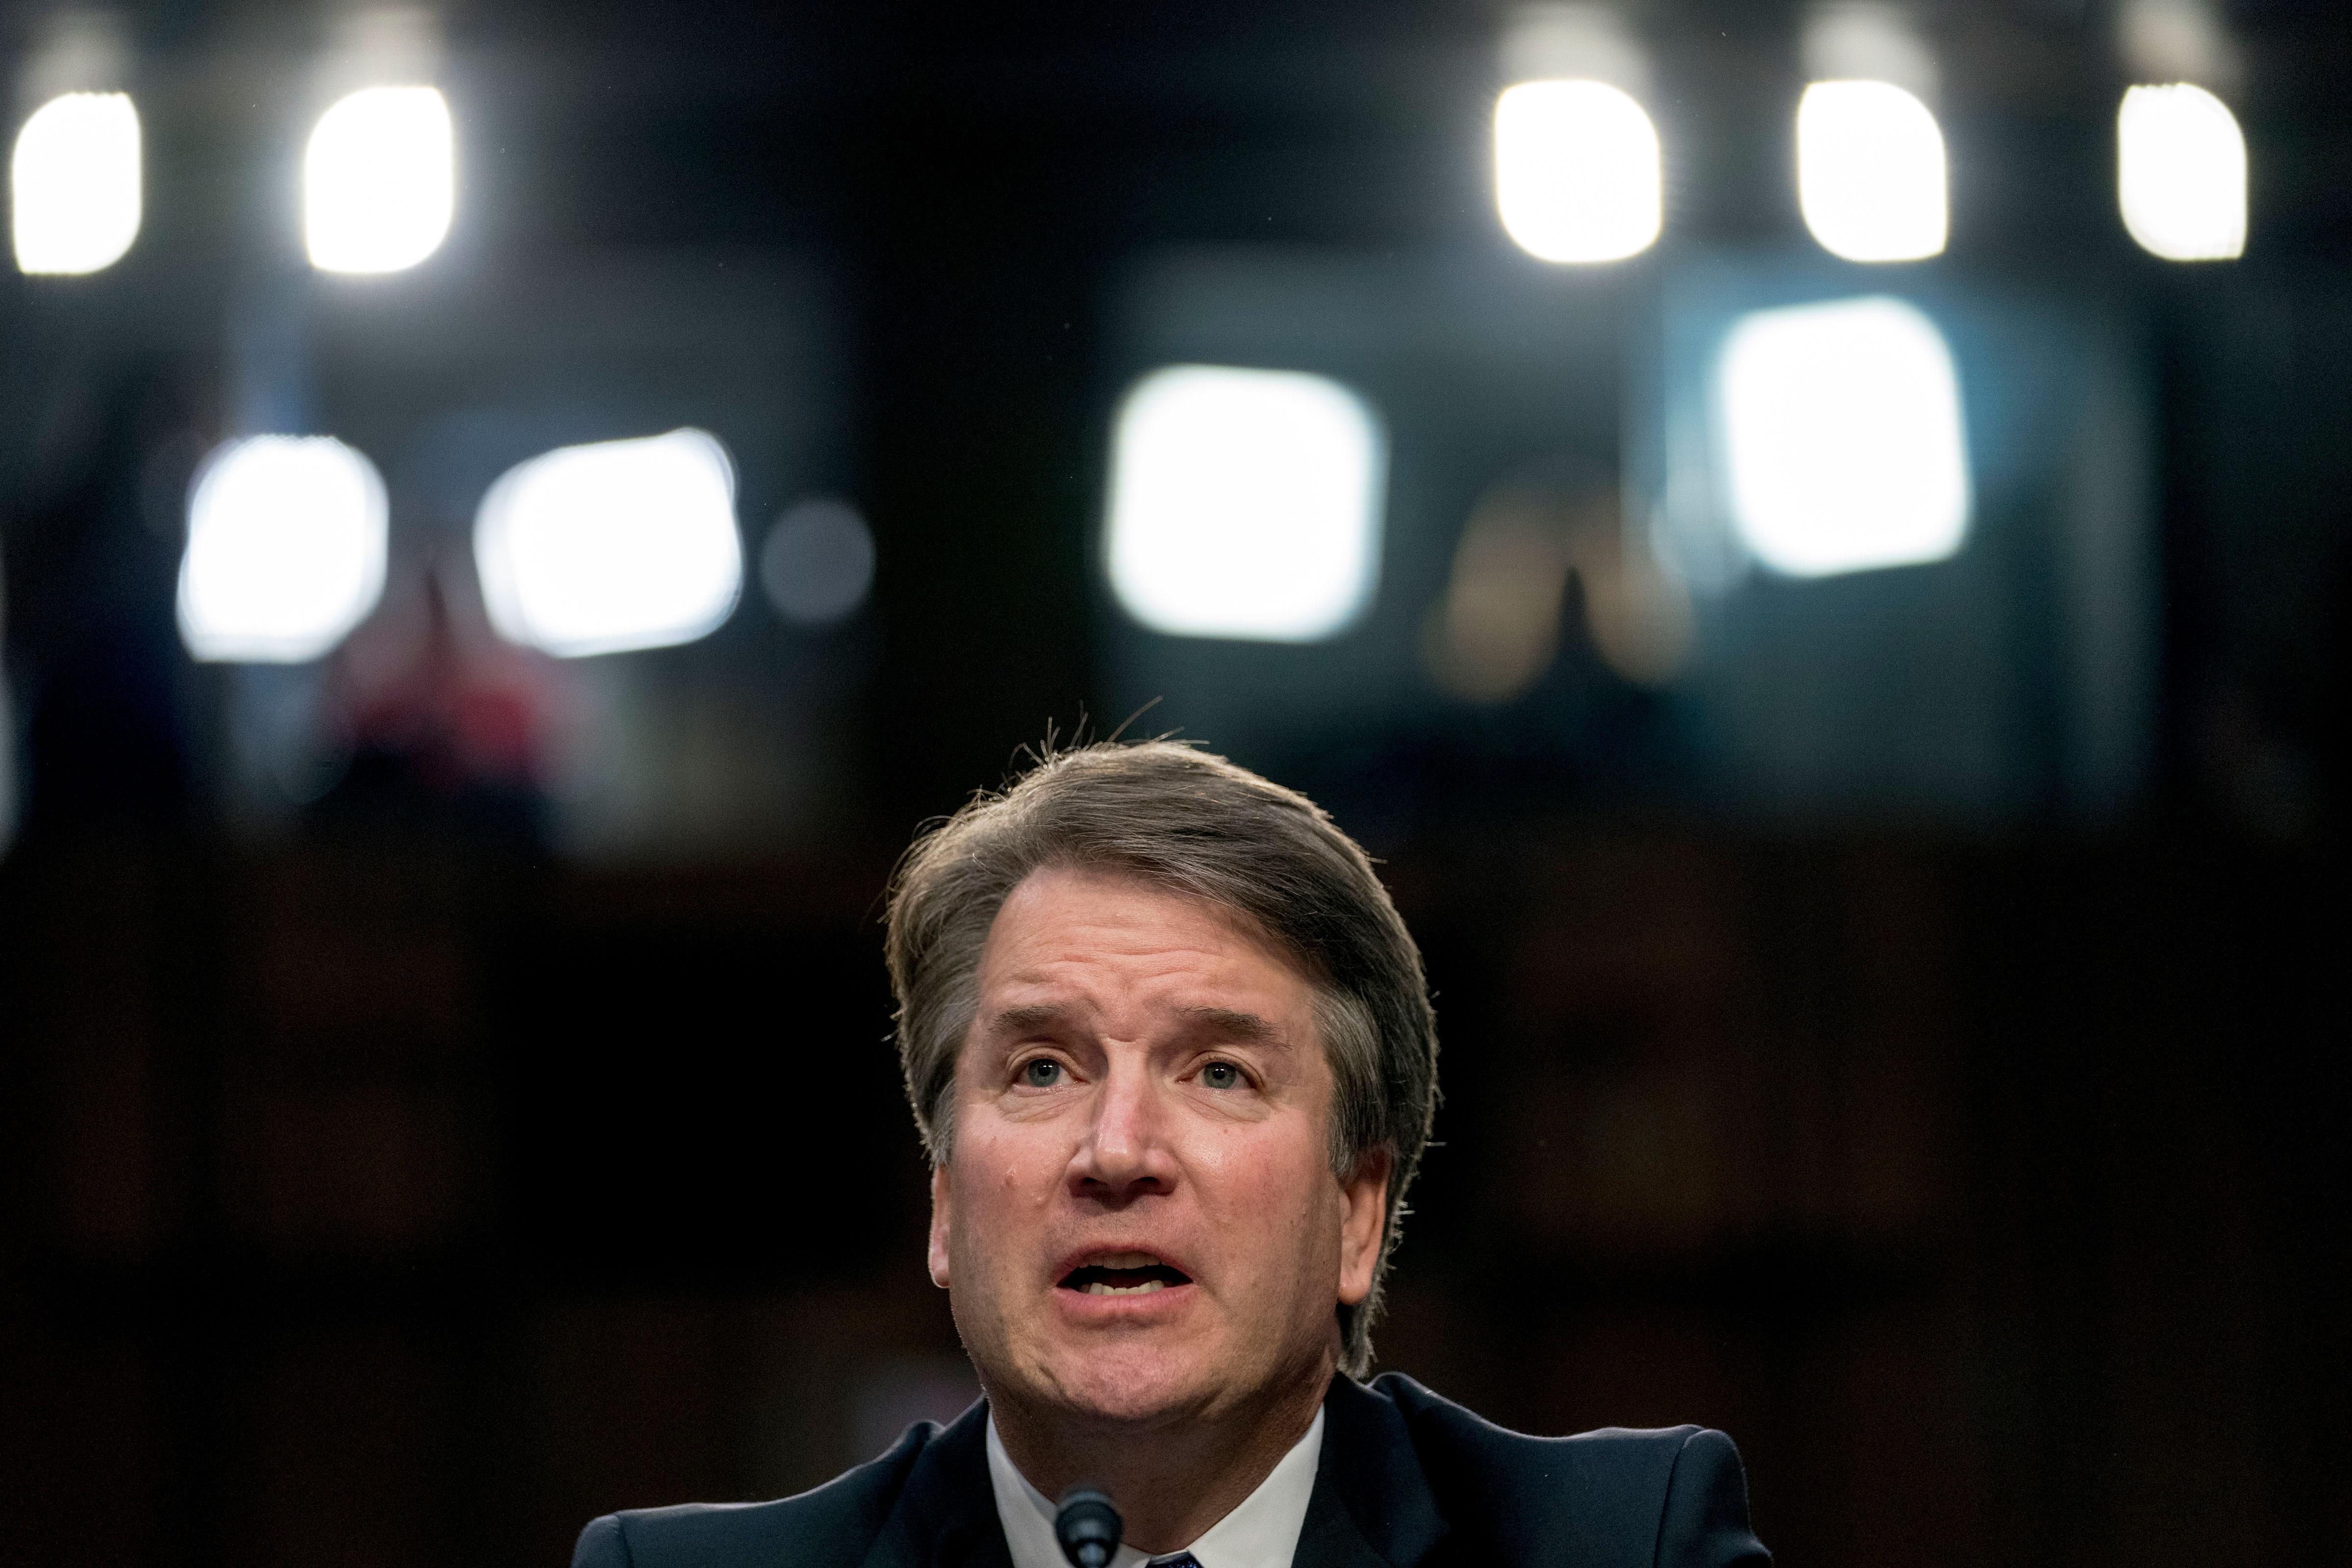 Photo: Kavanaugh Senate Confirmation Hearings 4 | Kavanaugh Speaks - AP